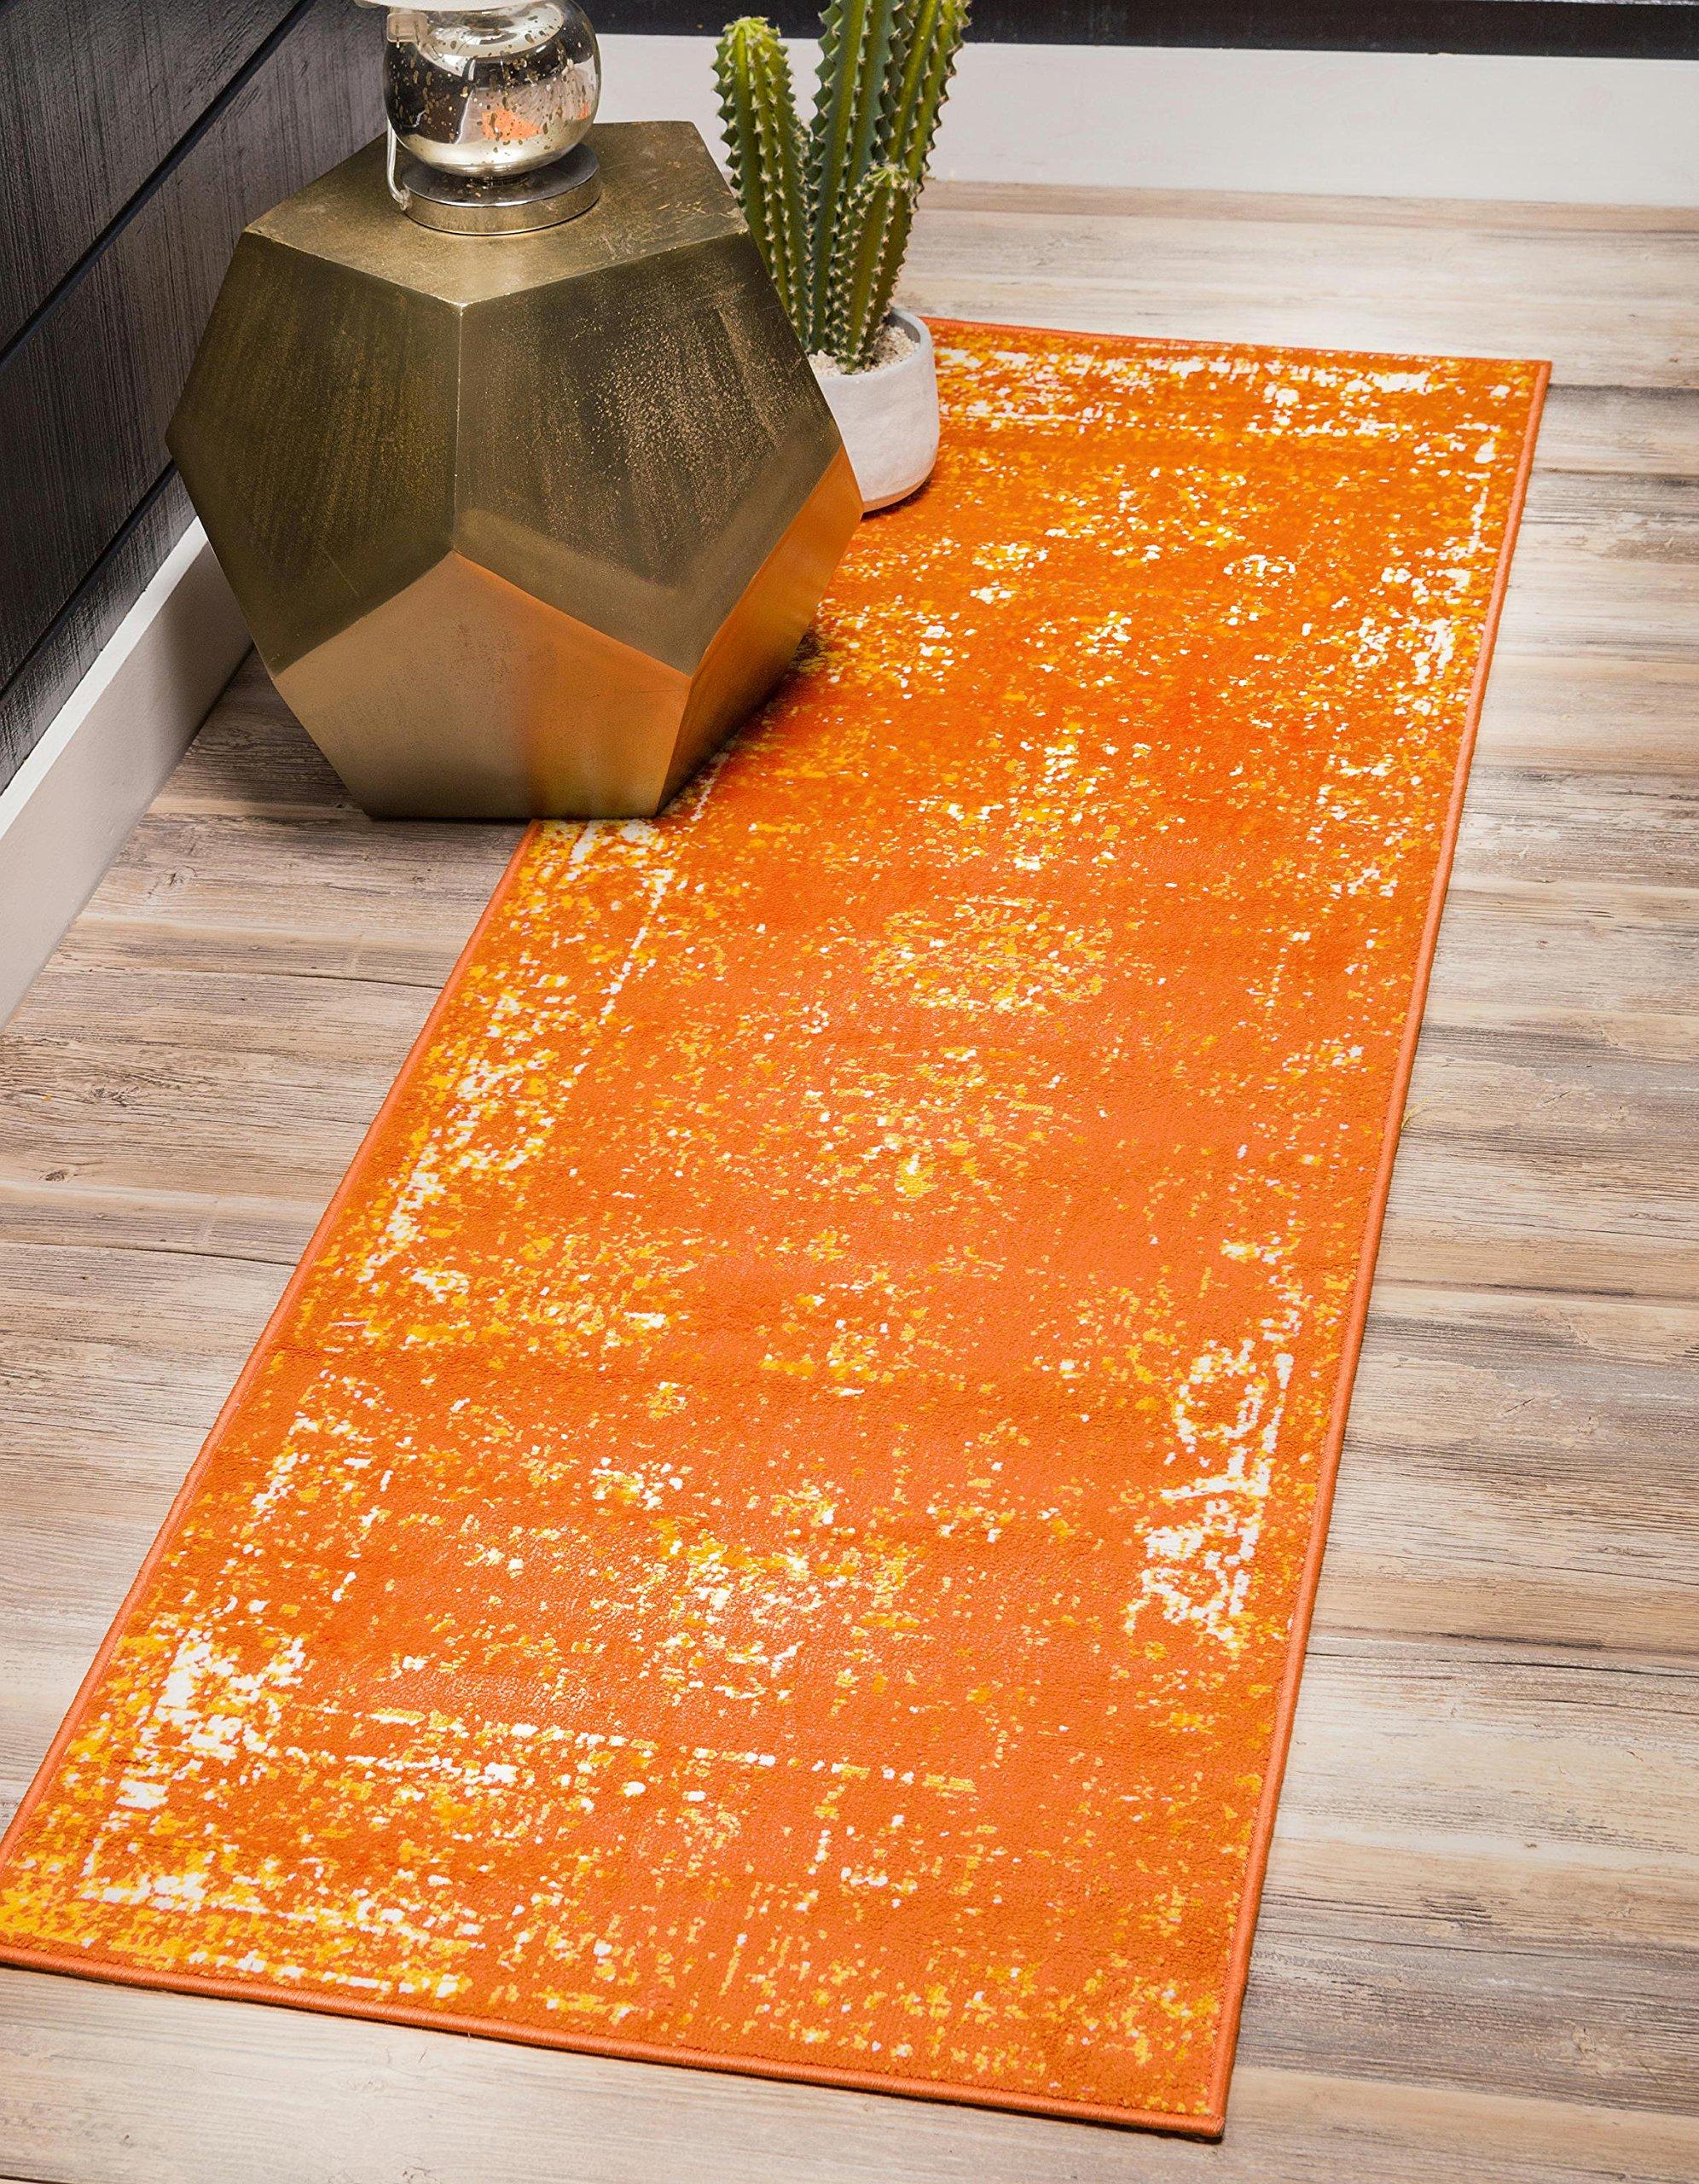 Unique Loom Sofia Collection Traditional Vintage Orange Runner Rug (2' x 13')